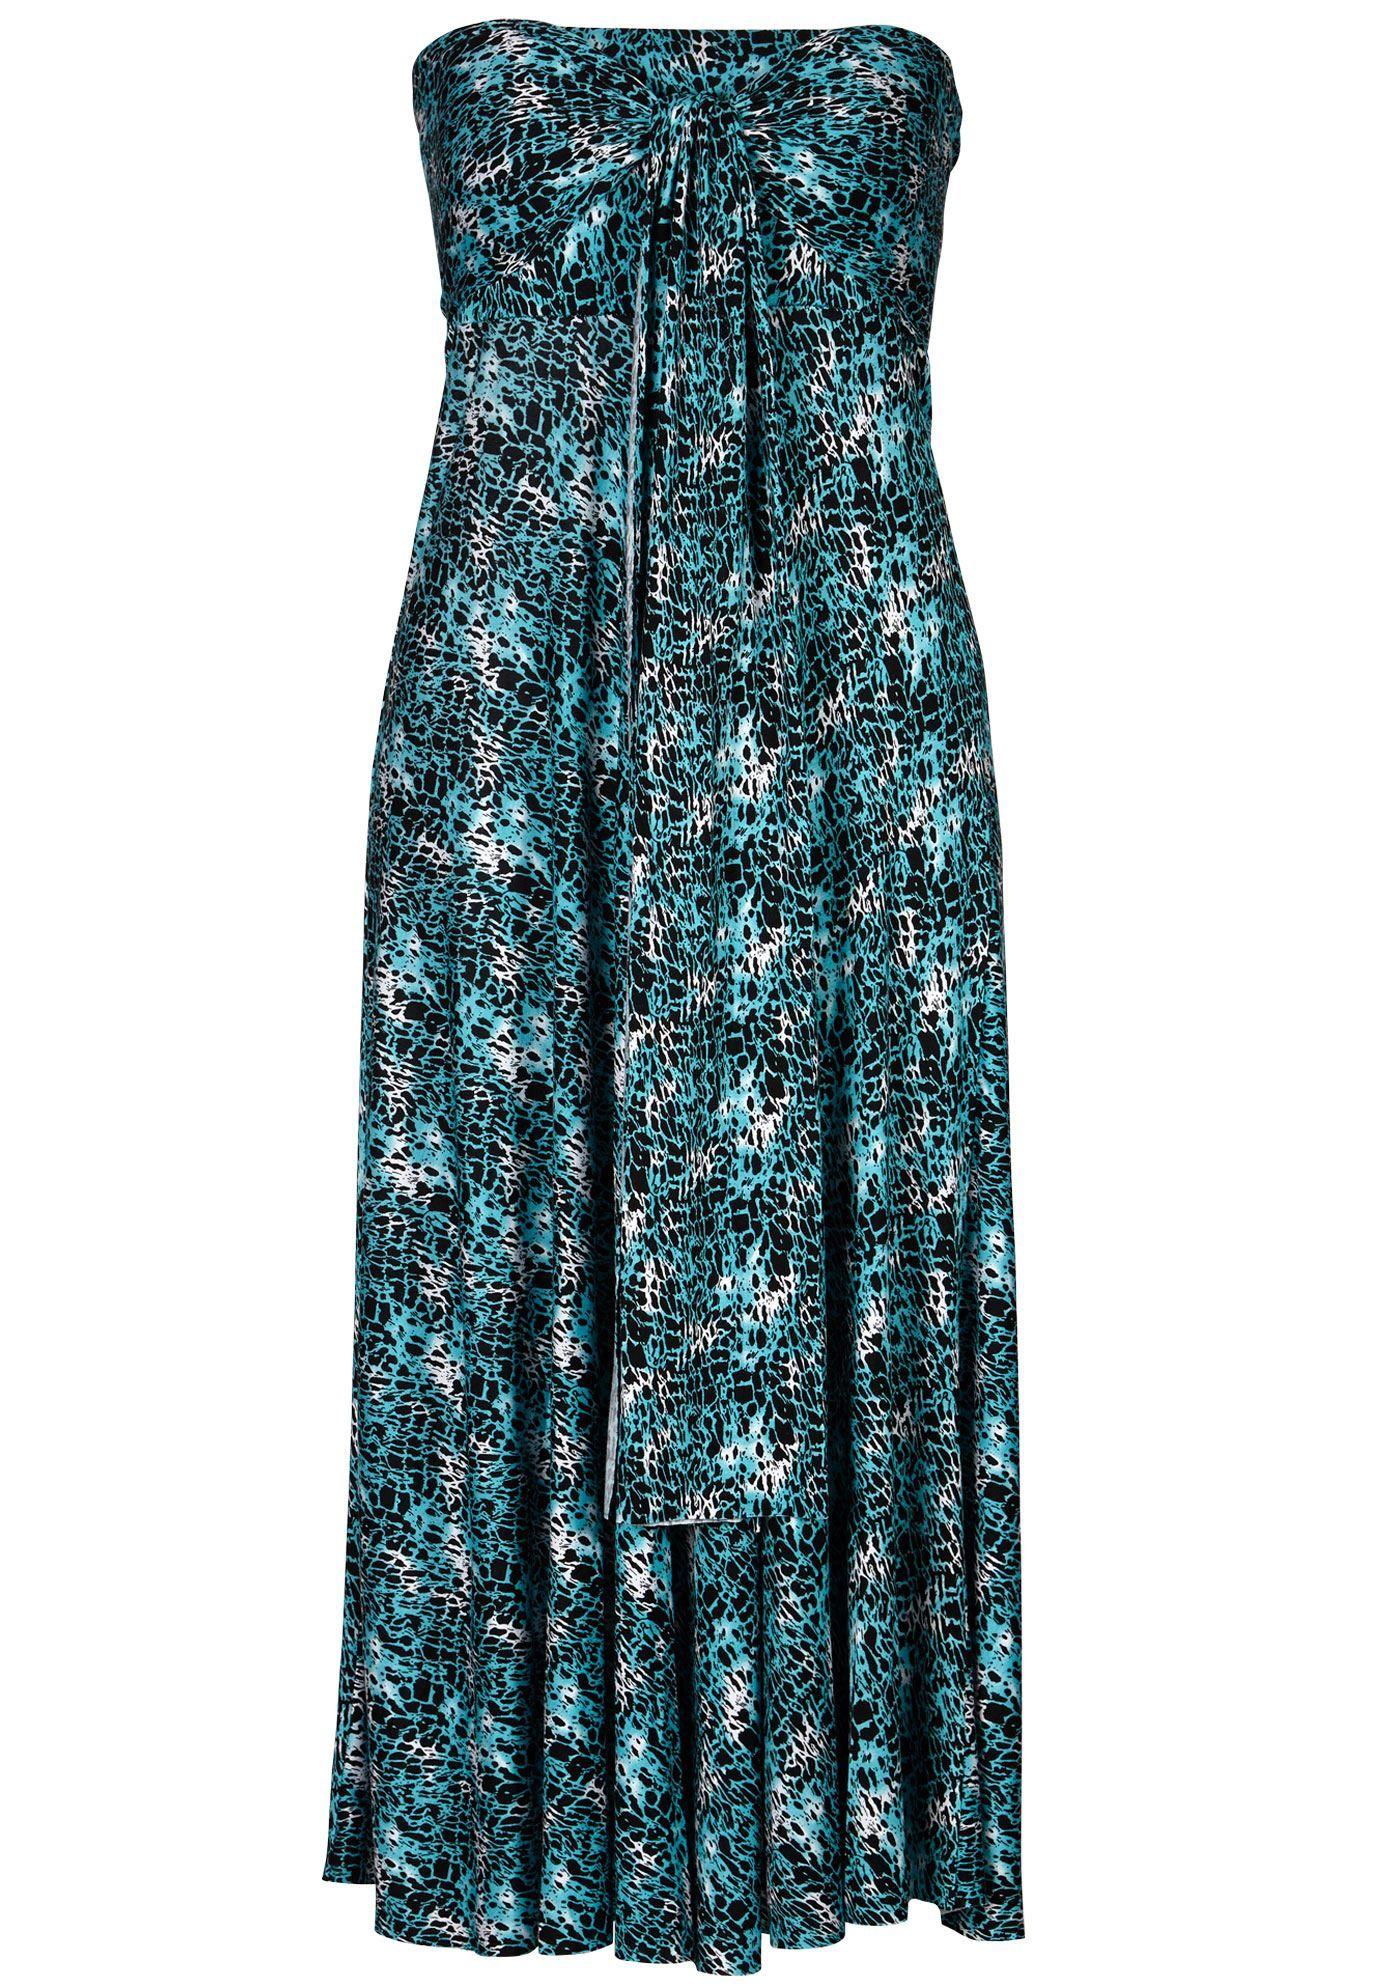 1c0bf2b5de591 Ellos Strapless Beach Dress Cover Up - Women s Plus Size Clothing ...